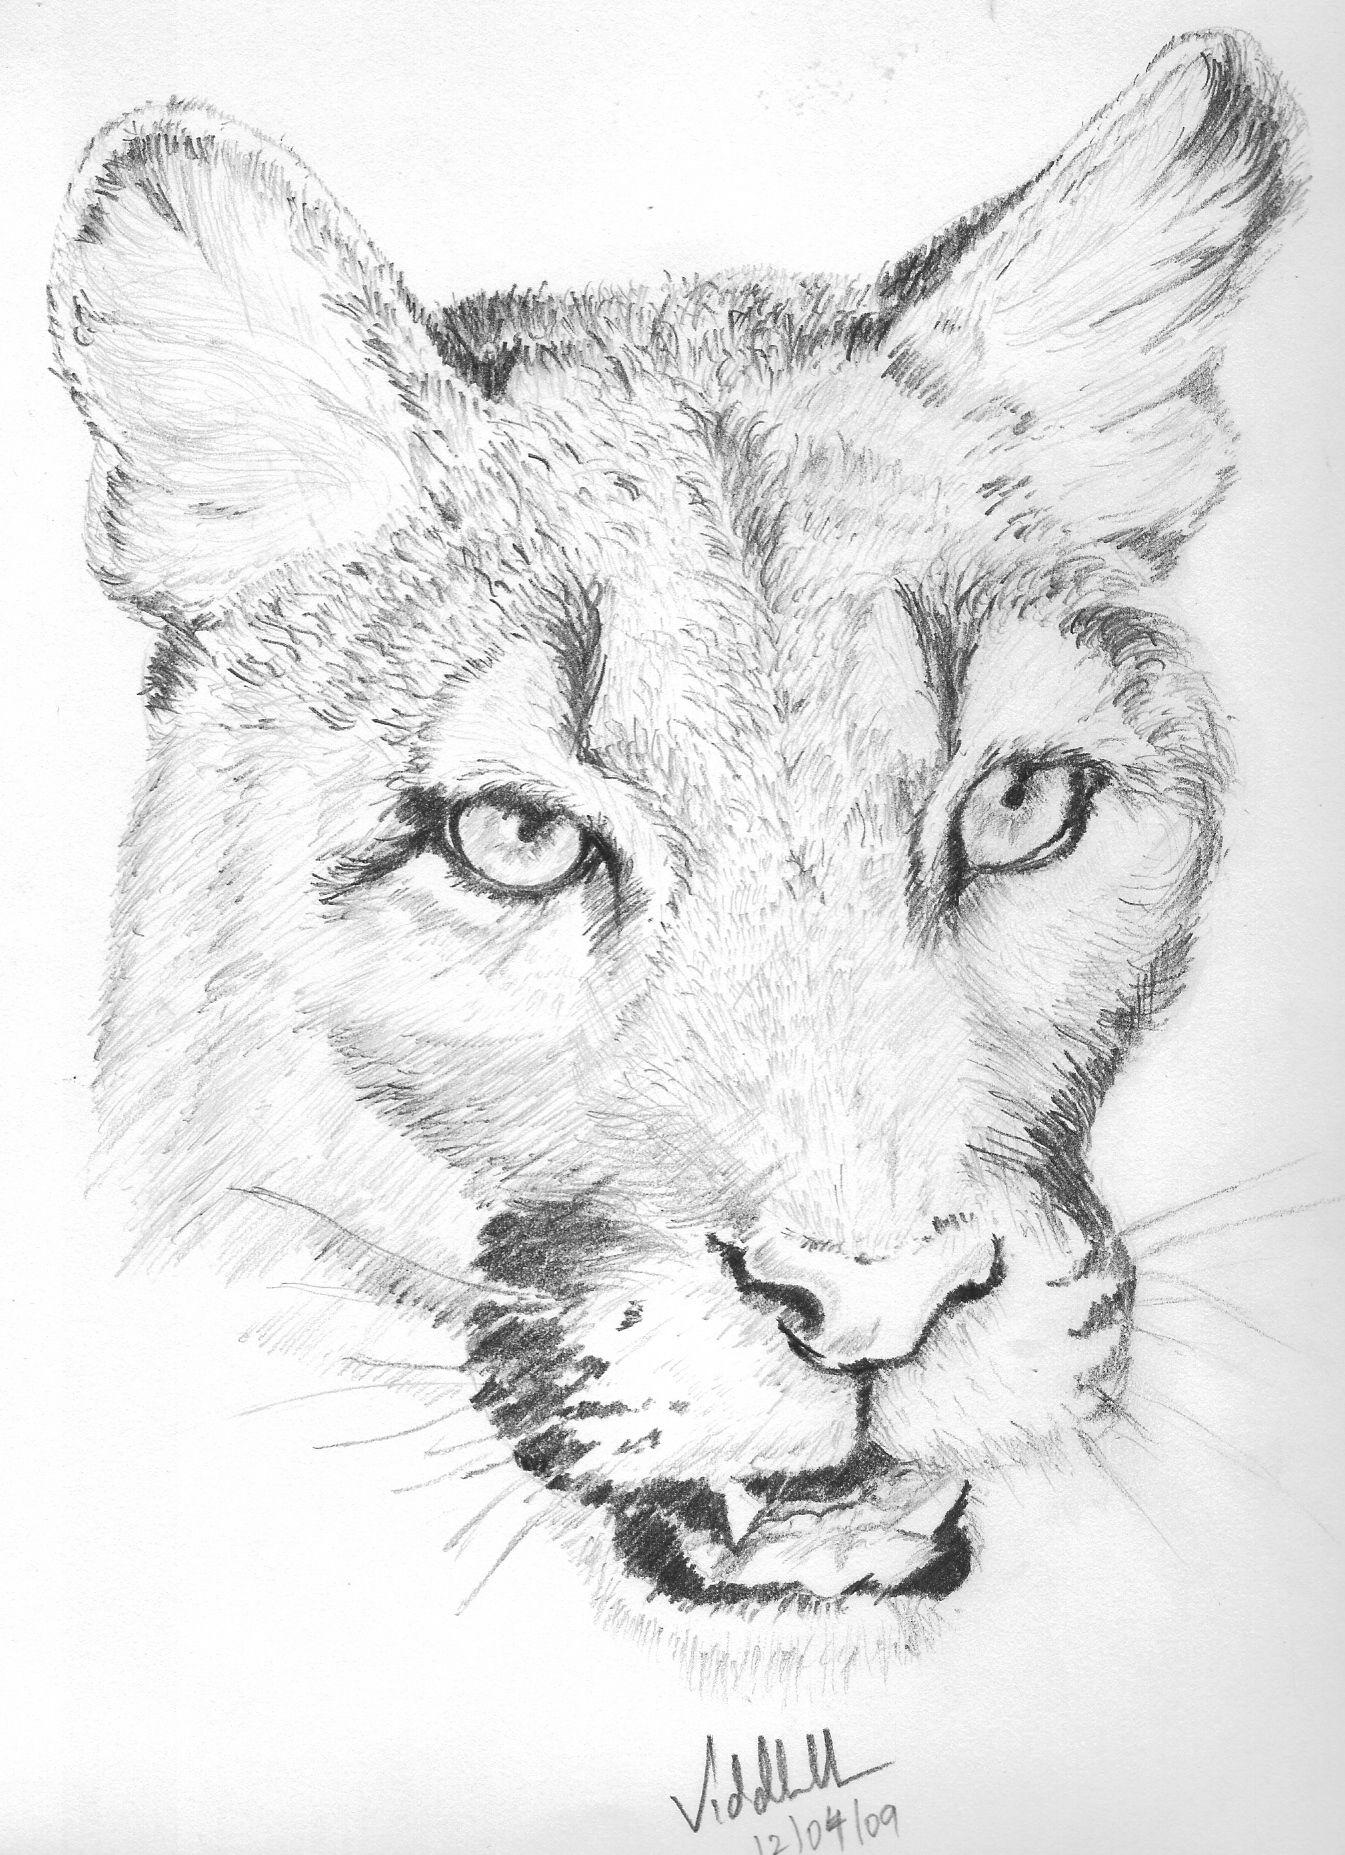 Animal Shading : animal, shading, Pencil, Shading, Drawings, Animals, Pencildrawing2019